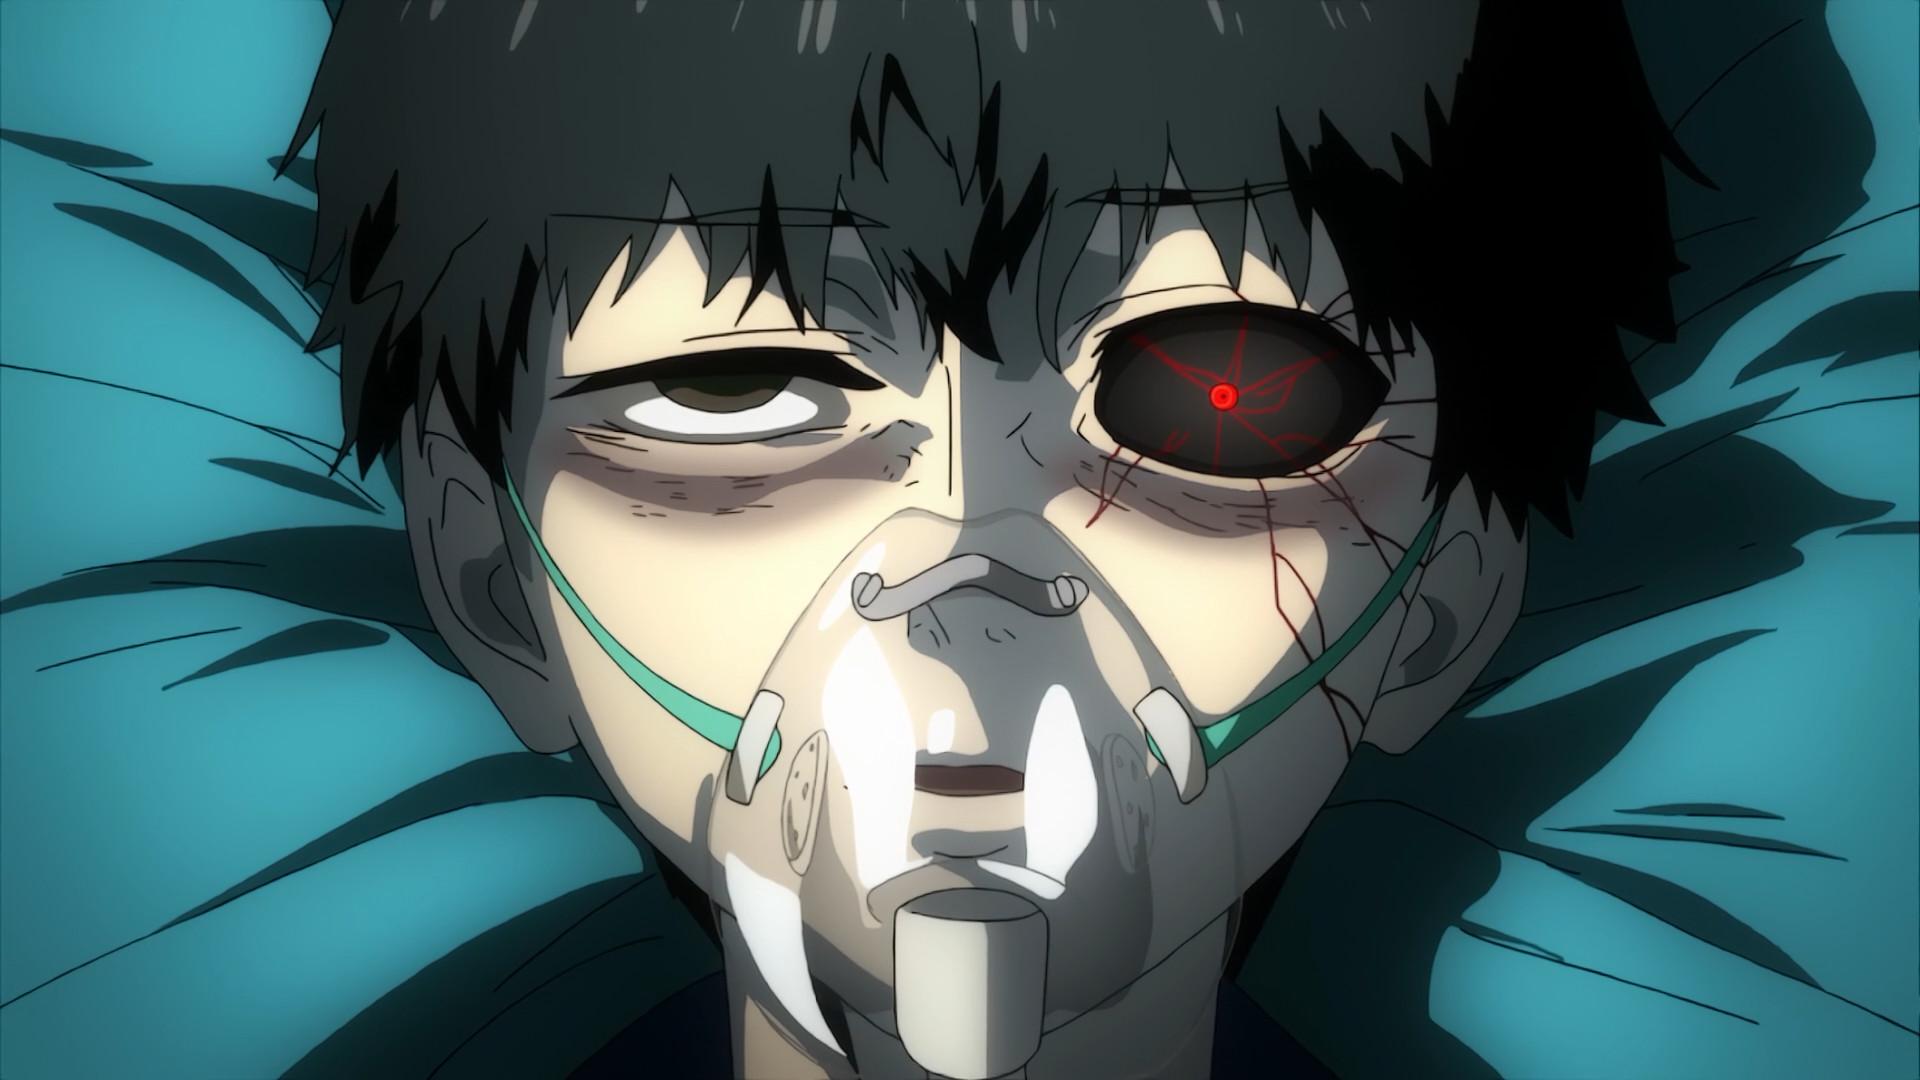 … his single transformed ghoul eye.